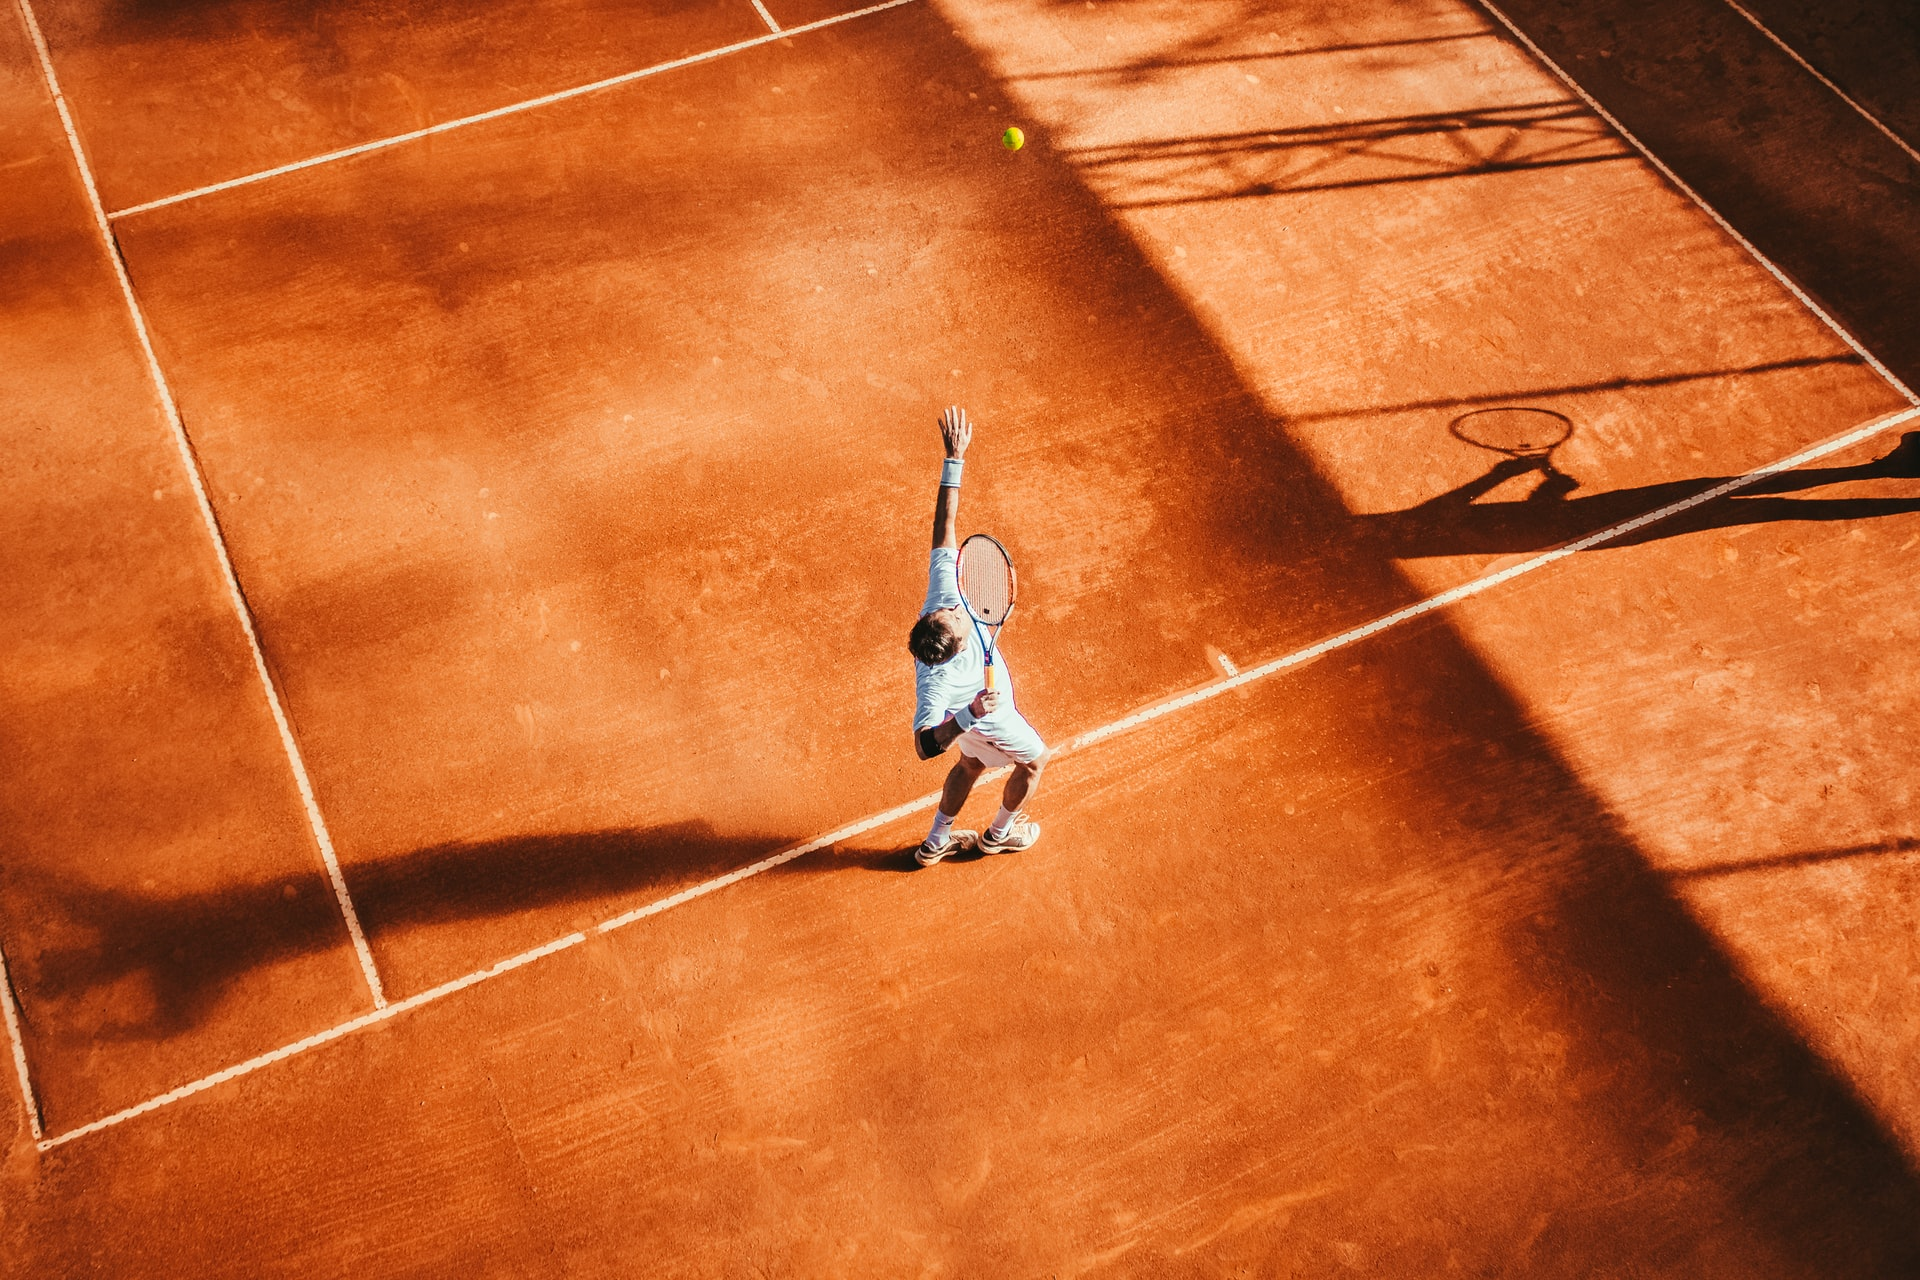 Australian Open 2021 Preview - Men's Singles